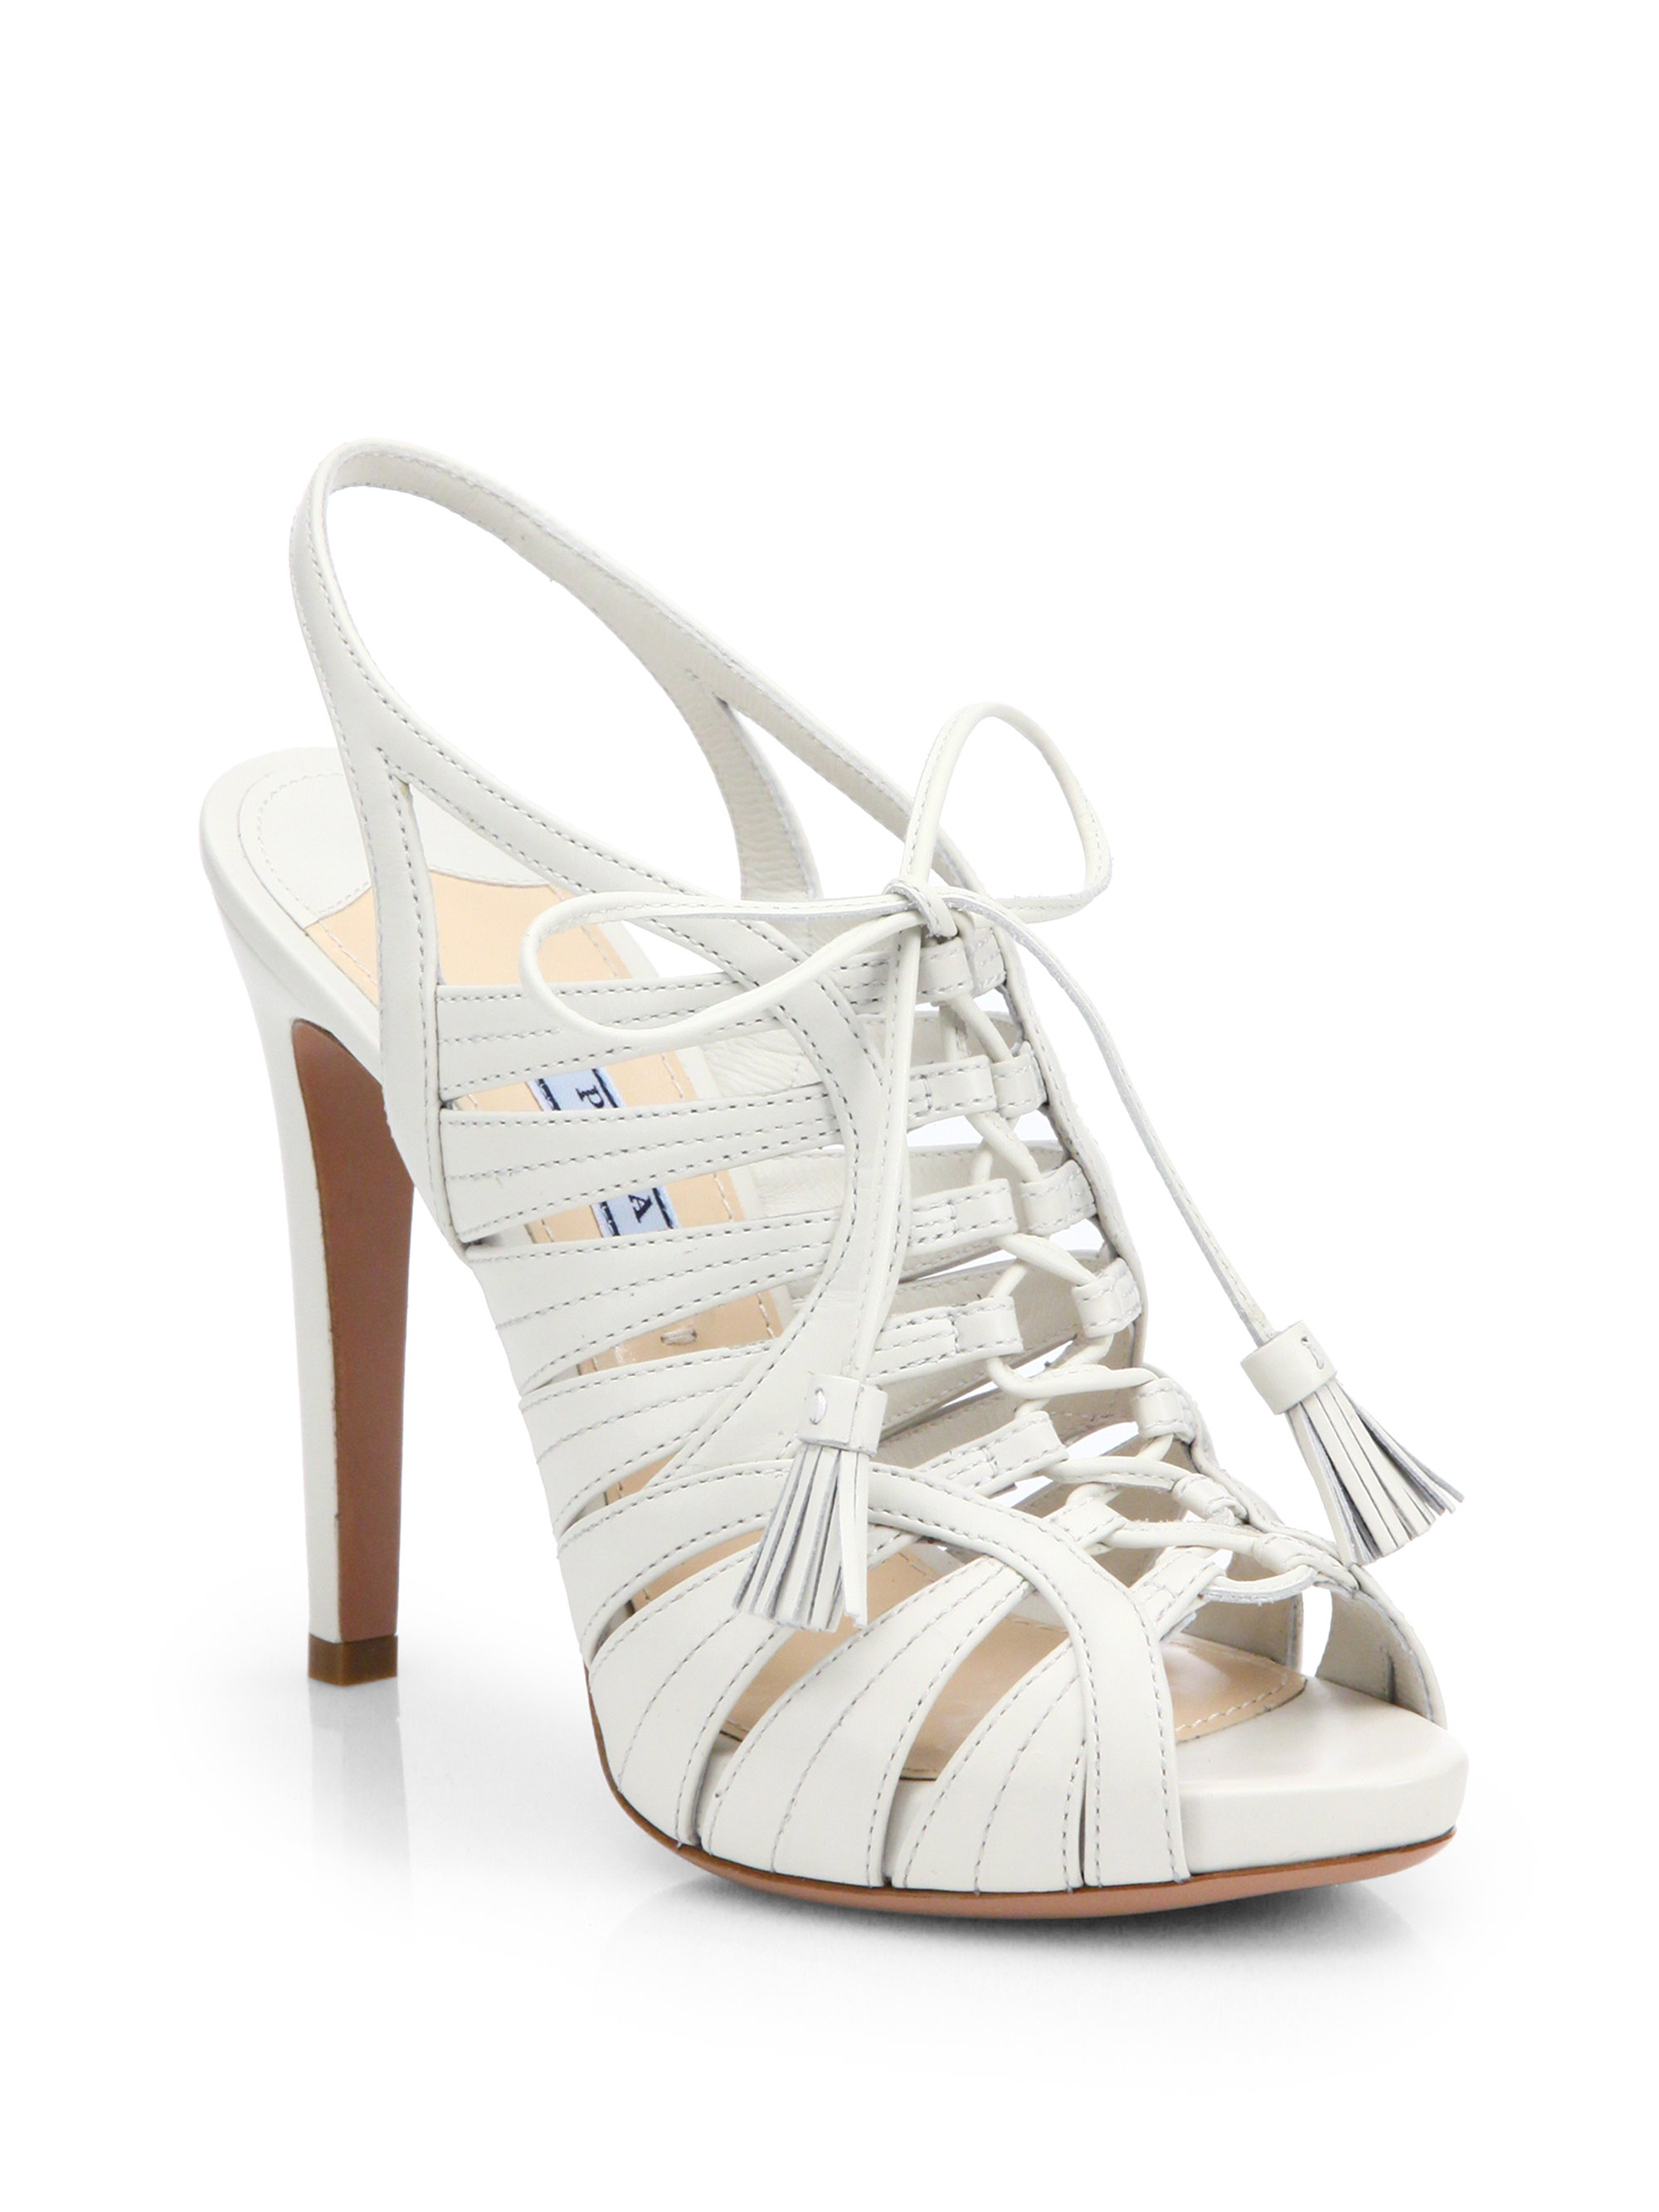 lace up tassel sandals